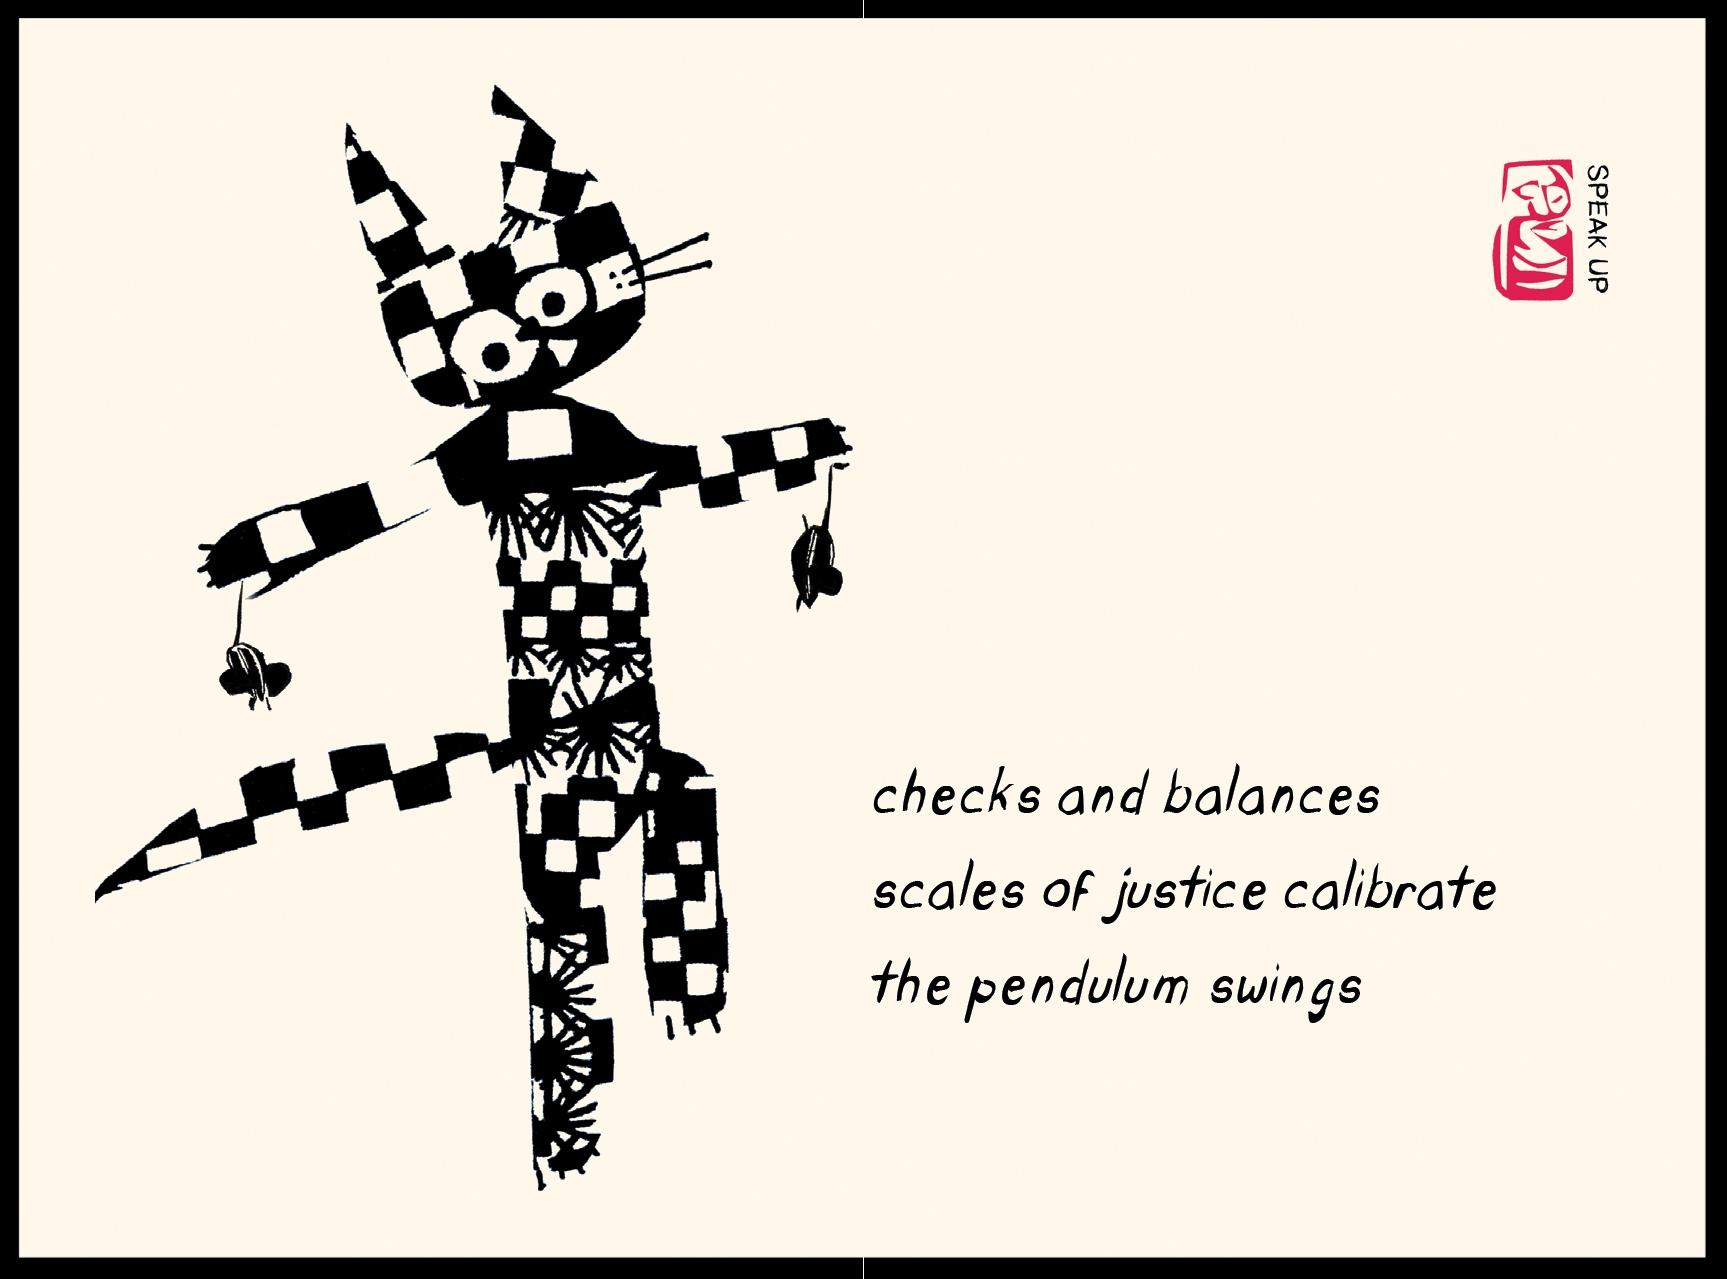 checksbalances_08.jpg